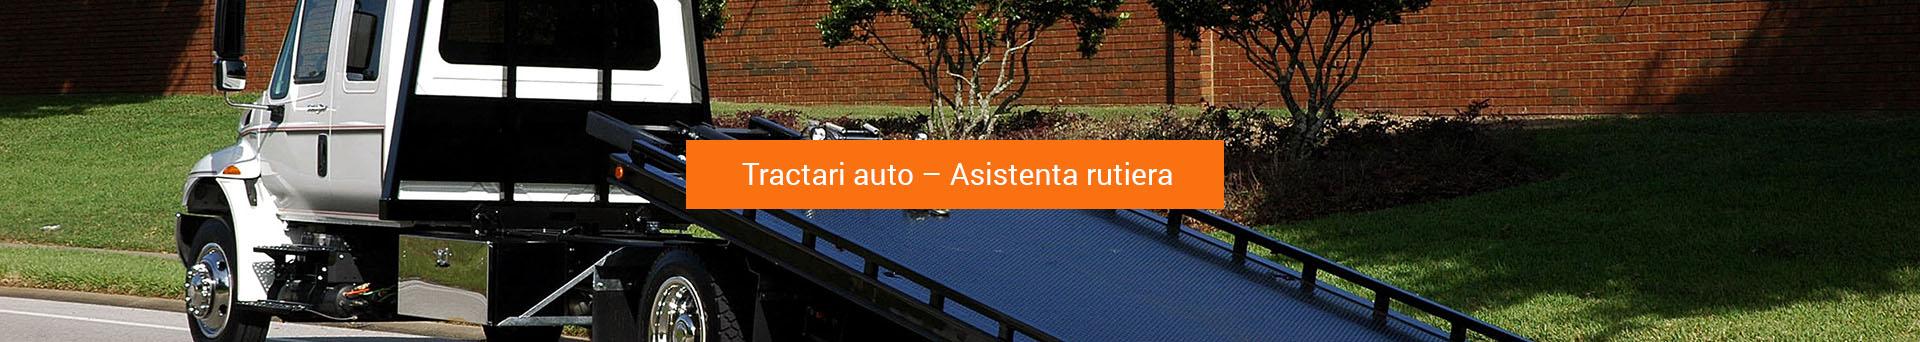 Tractari auto – Asistenta rutiera